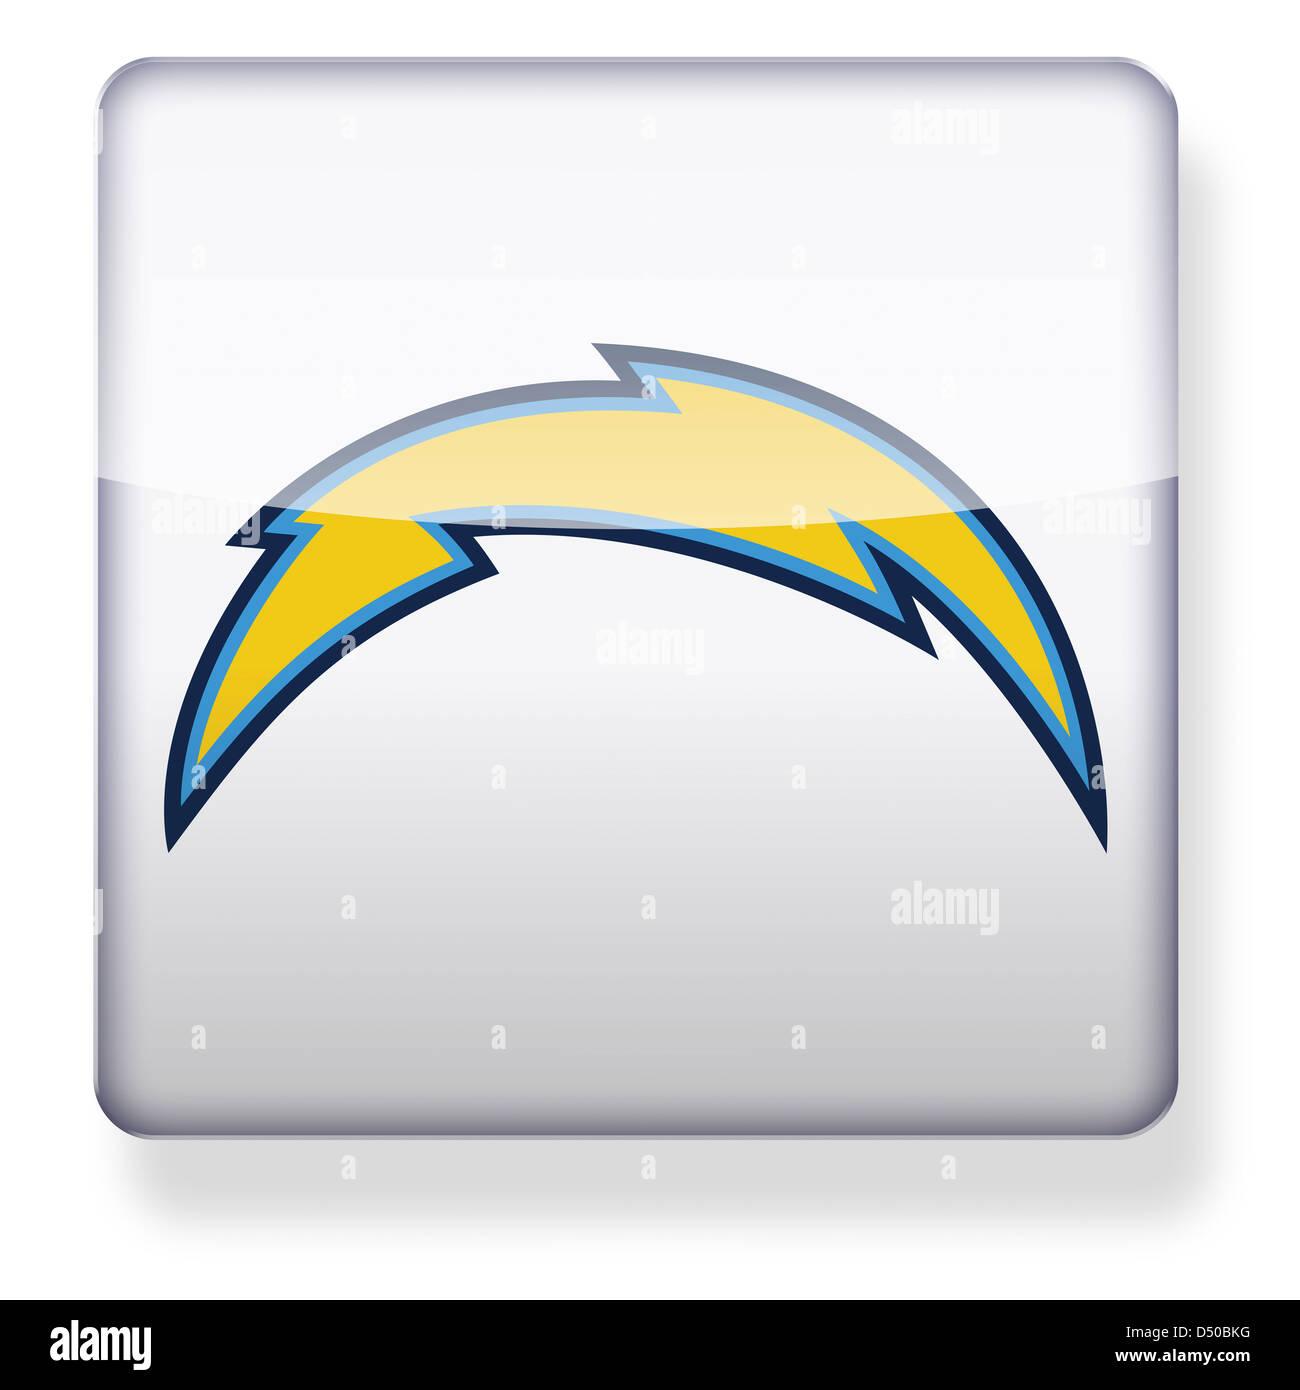 San Diego Chargers App: San Diego Icon Stock Photos & San Diego Icon Stock Images